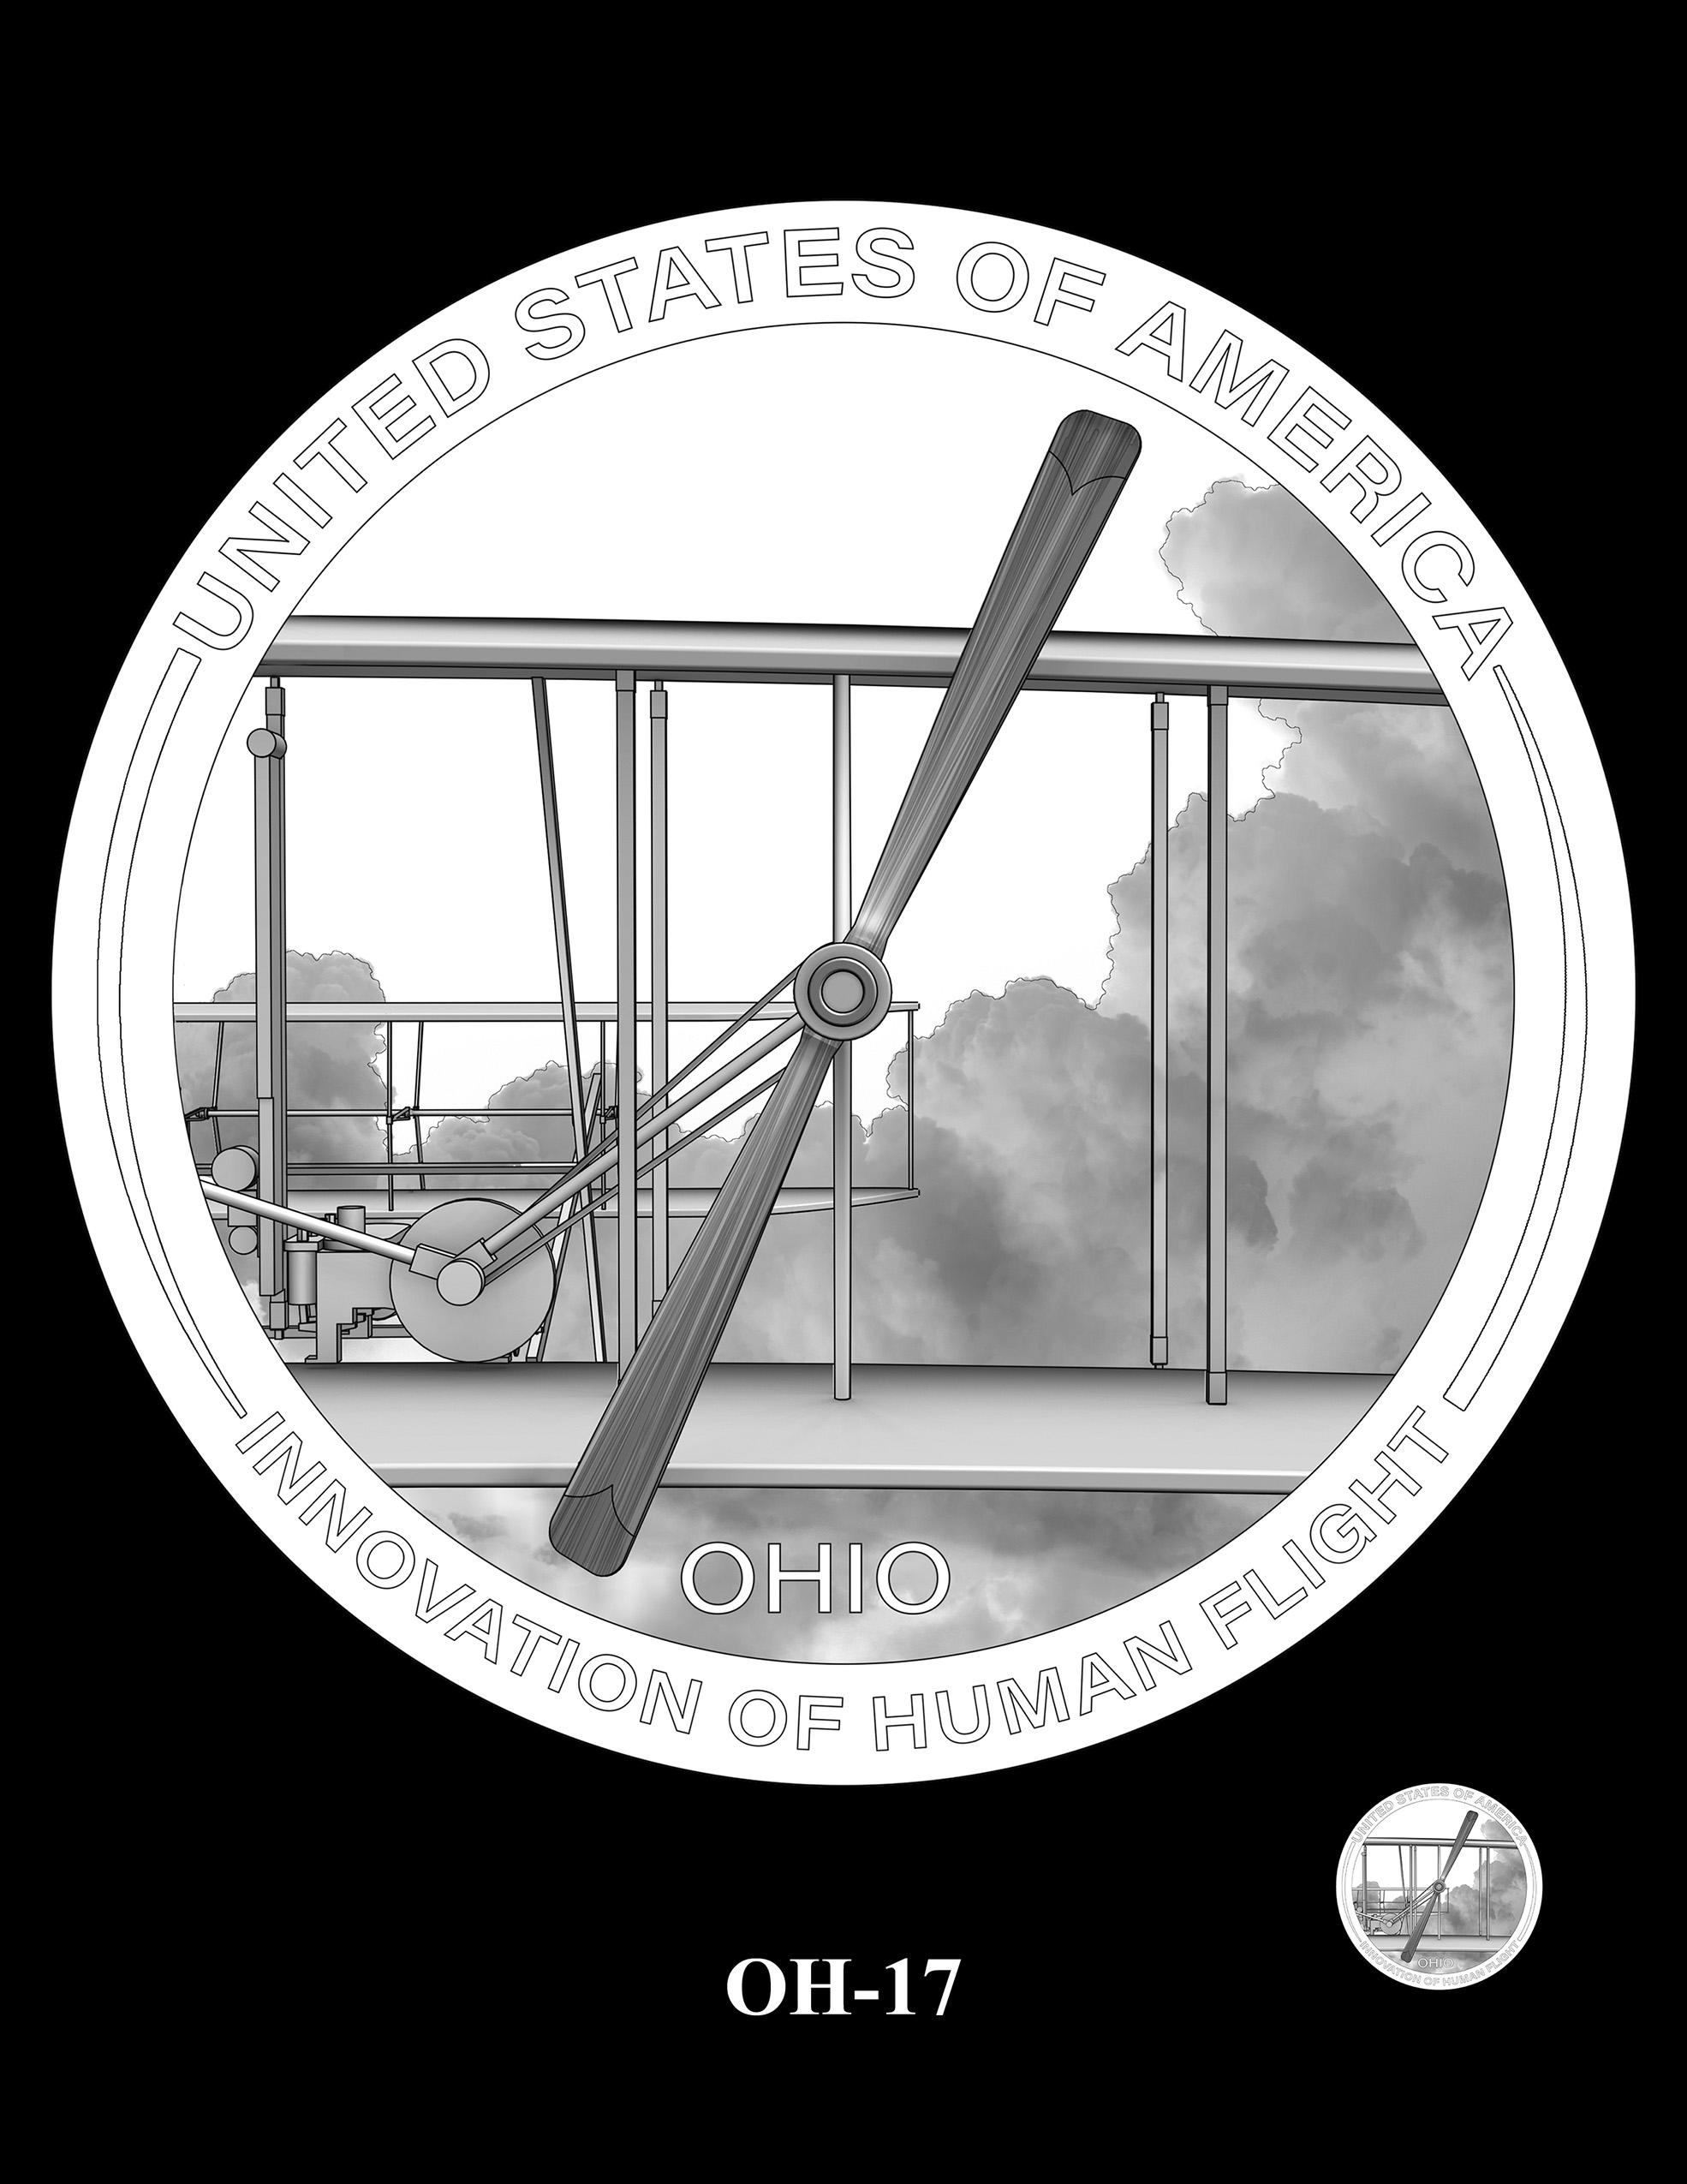 OH-17 -- 2023 American Innovation $1 Coin Program - Ohio